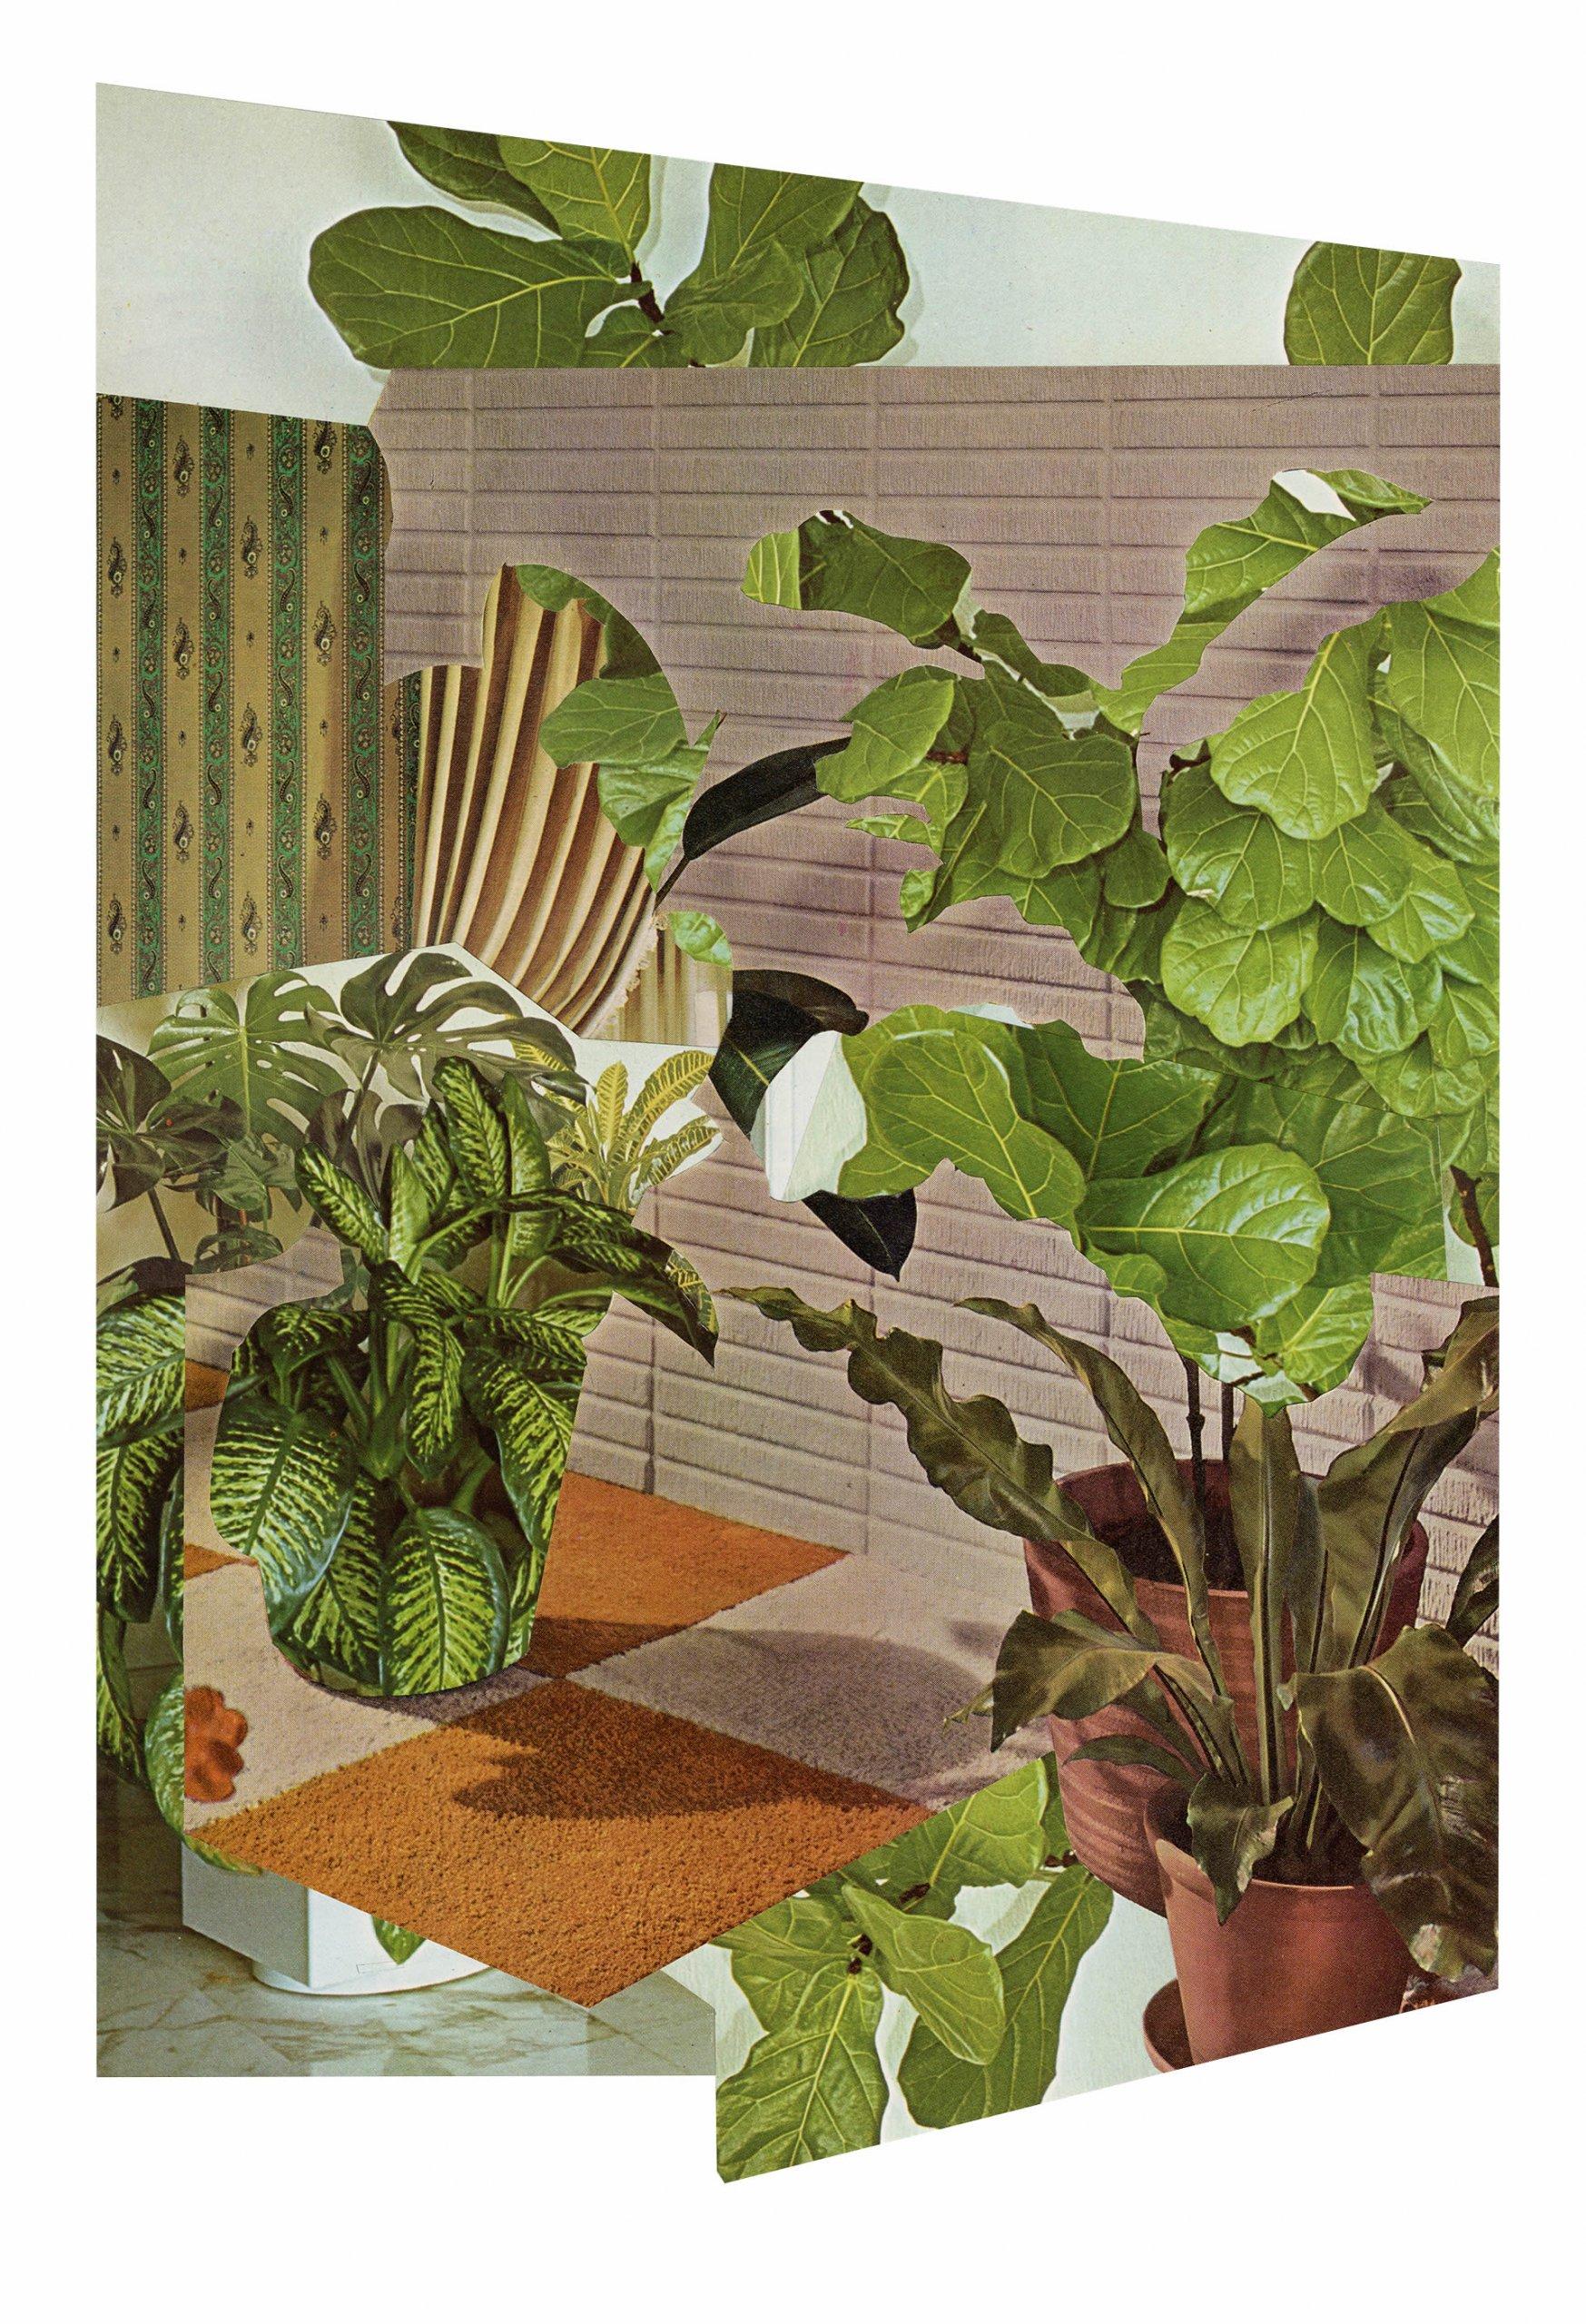 Aimee-Henny-Brown-Urban-Fortress-Interior-III-Online-Art-Galleries